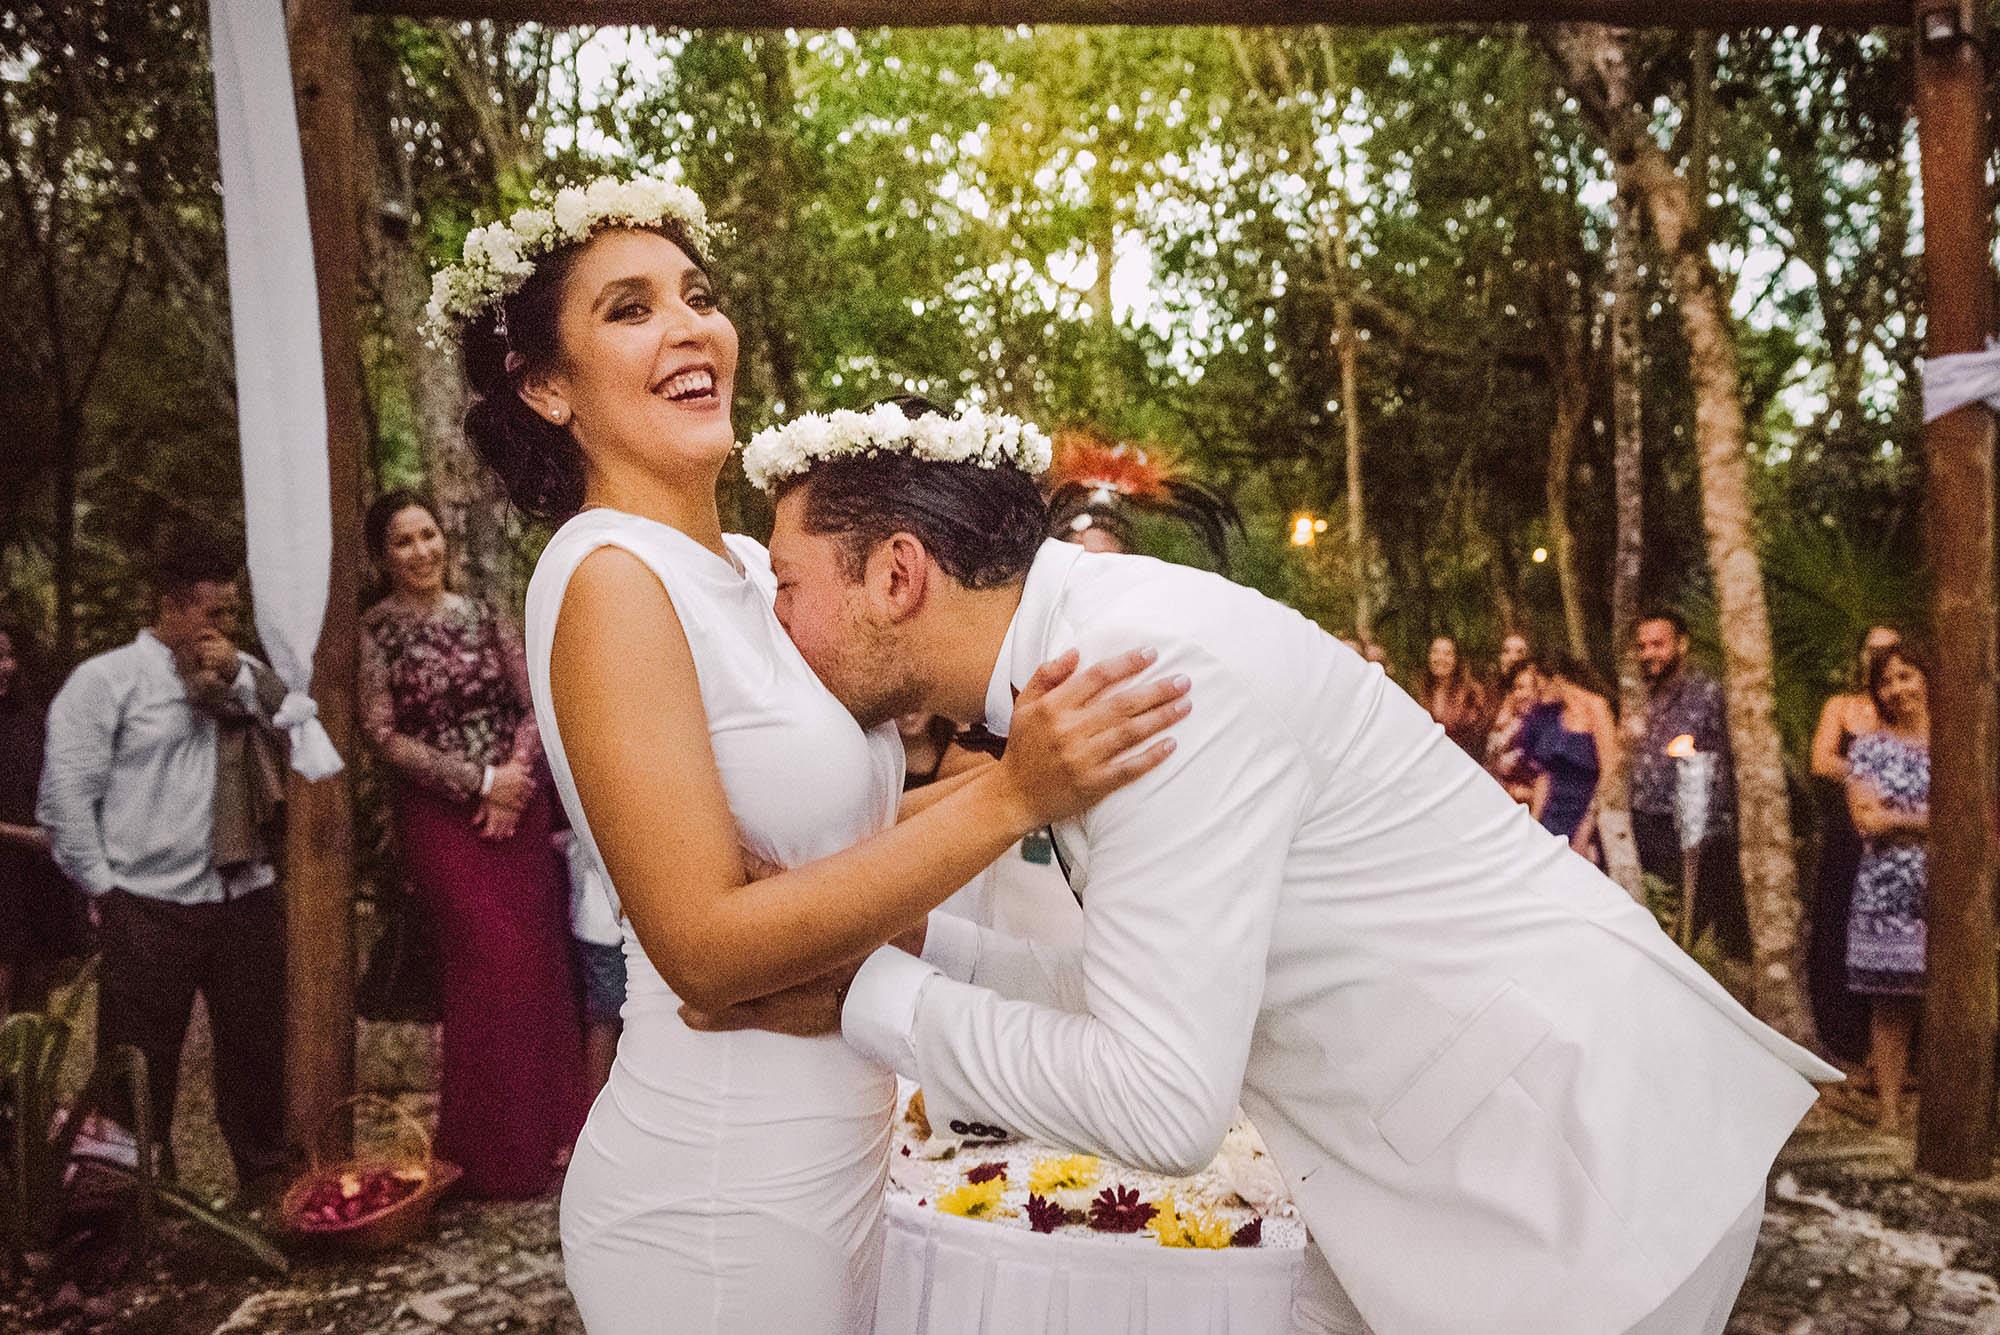 Wedding playa del carmen planner destination mexico magali espinosa42-WEB.jpg